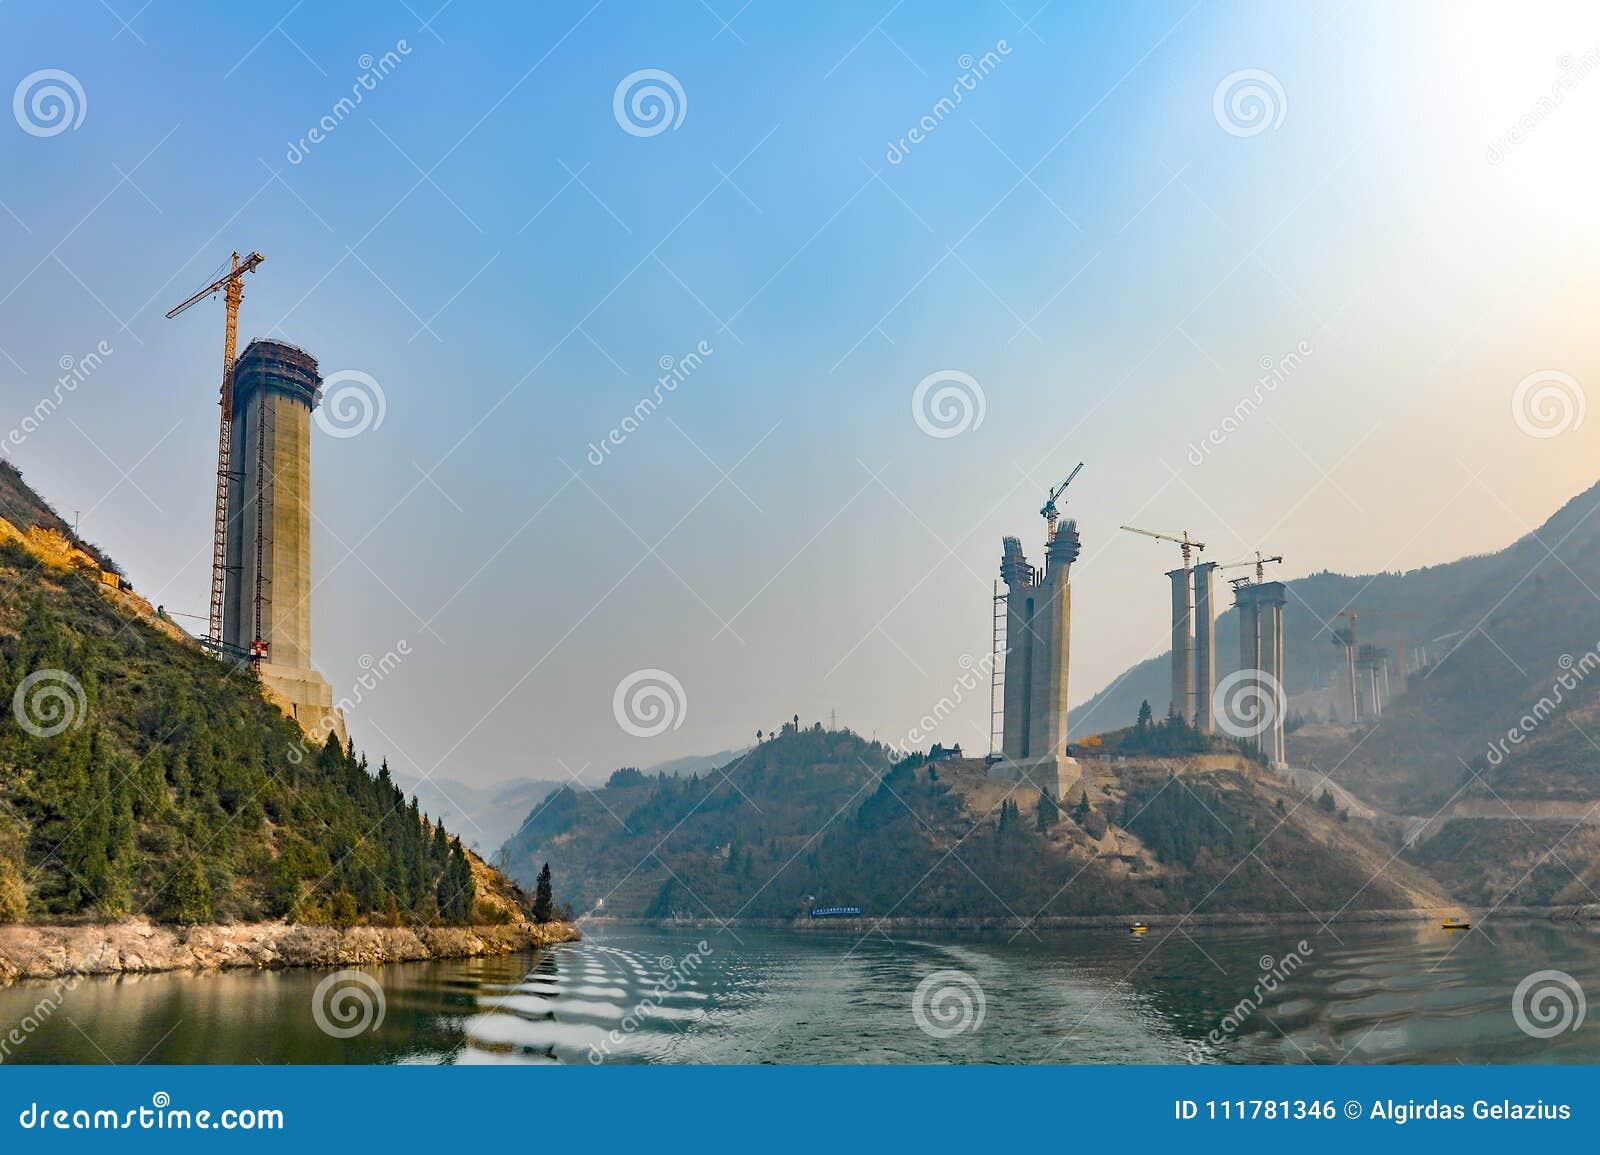 Building process of a Yangtze river bridge